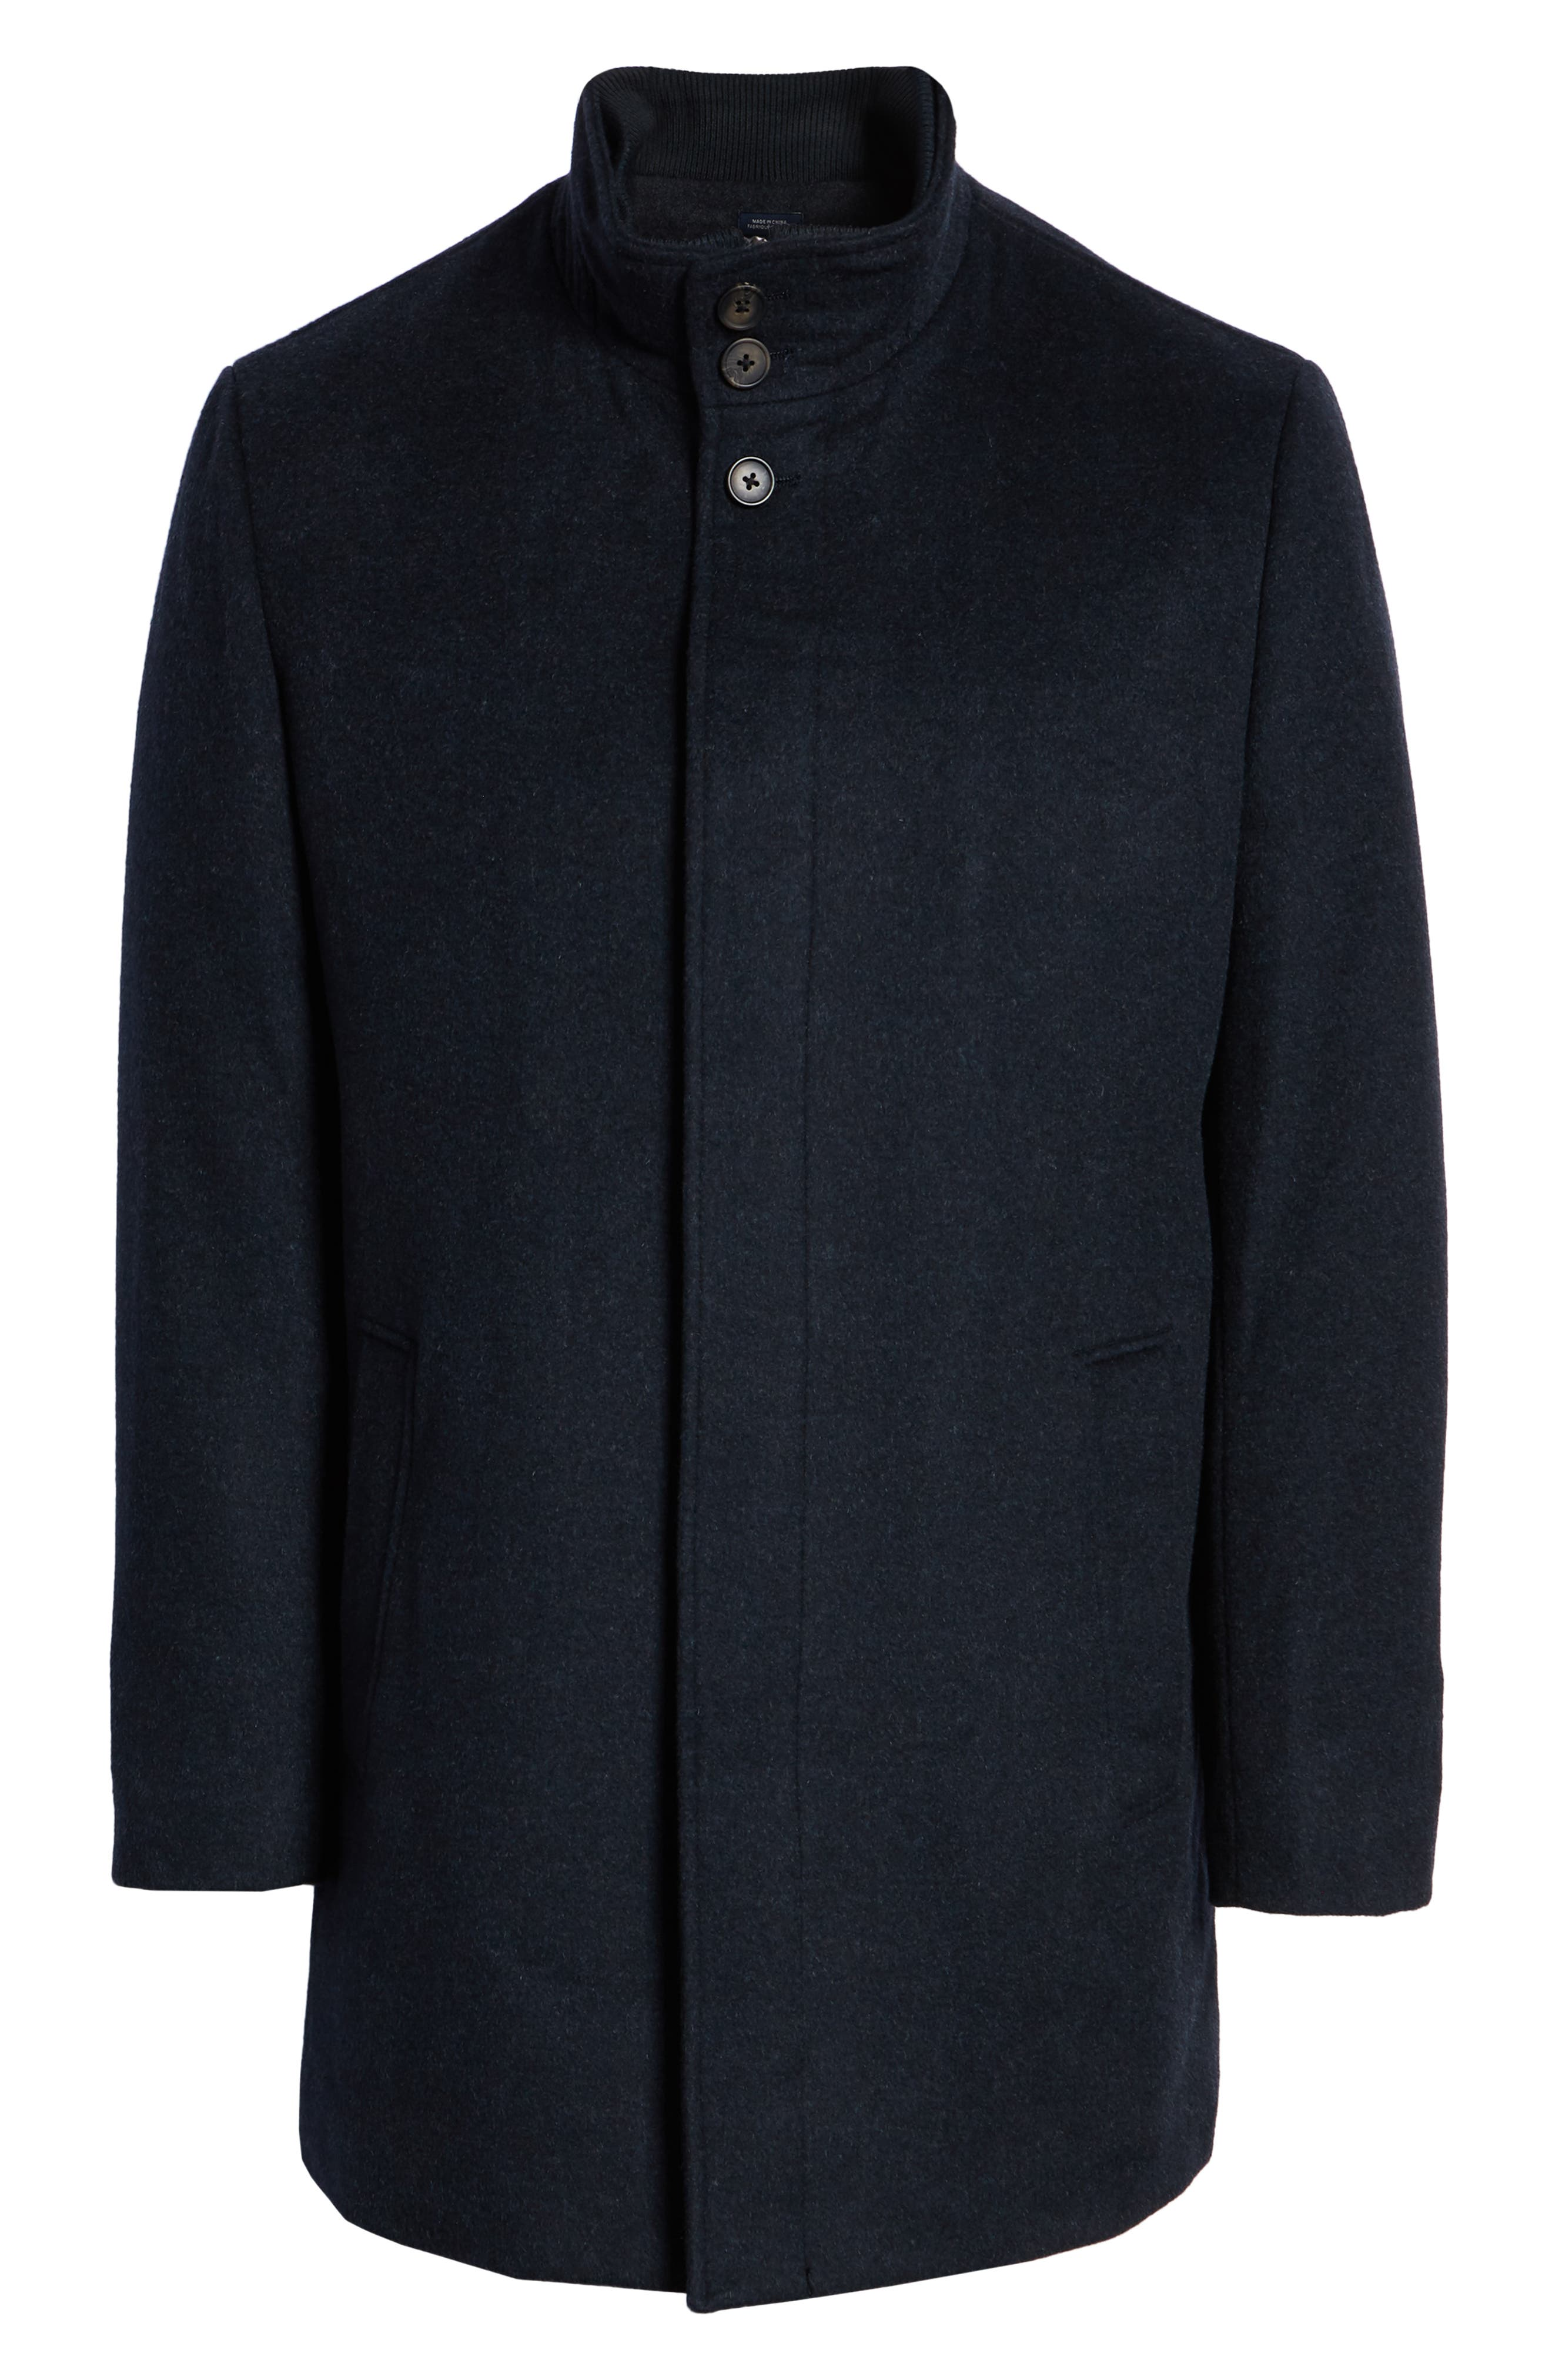 Hudson Wool Car Coat,                             Alternate thumbnail 5, color,                             NAVY MELANGE